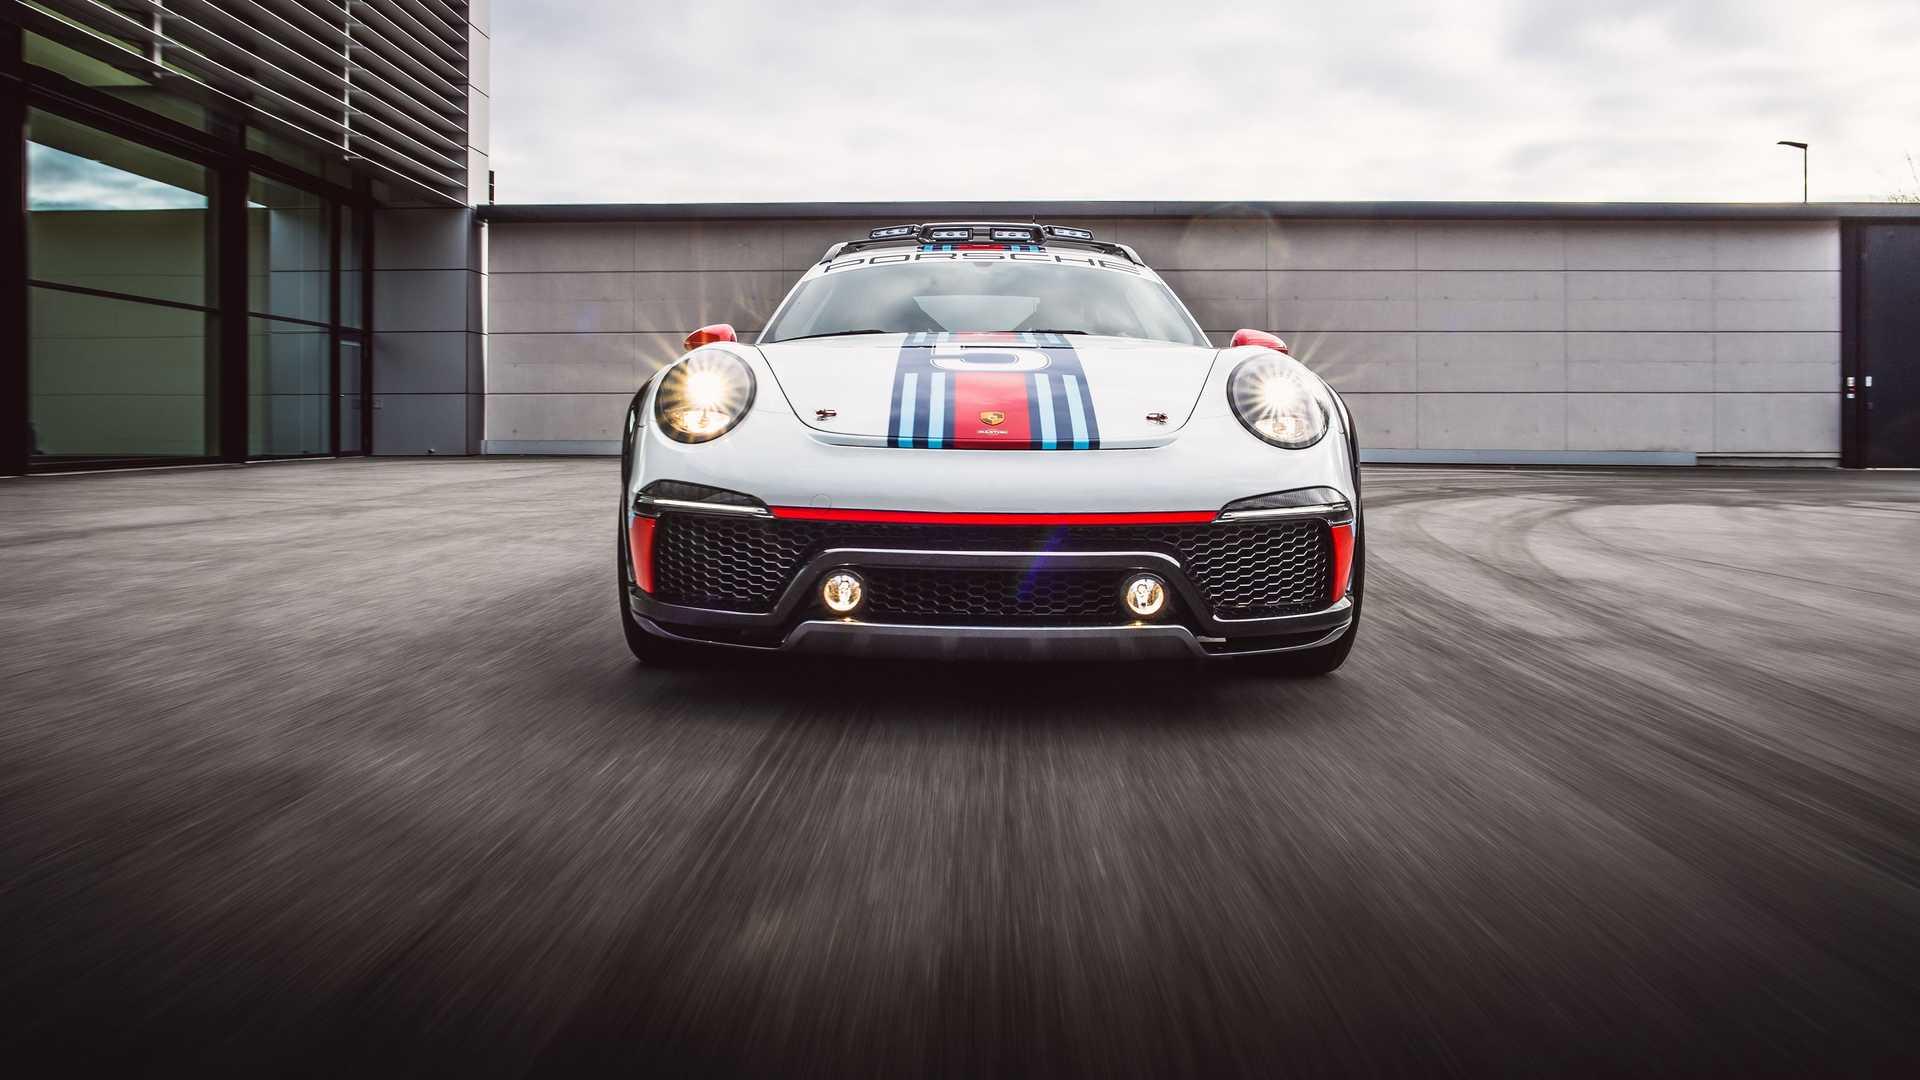 Porsche-911-Vision-Safari-4